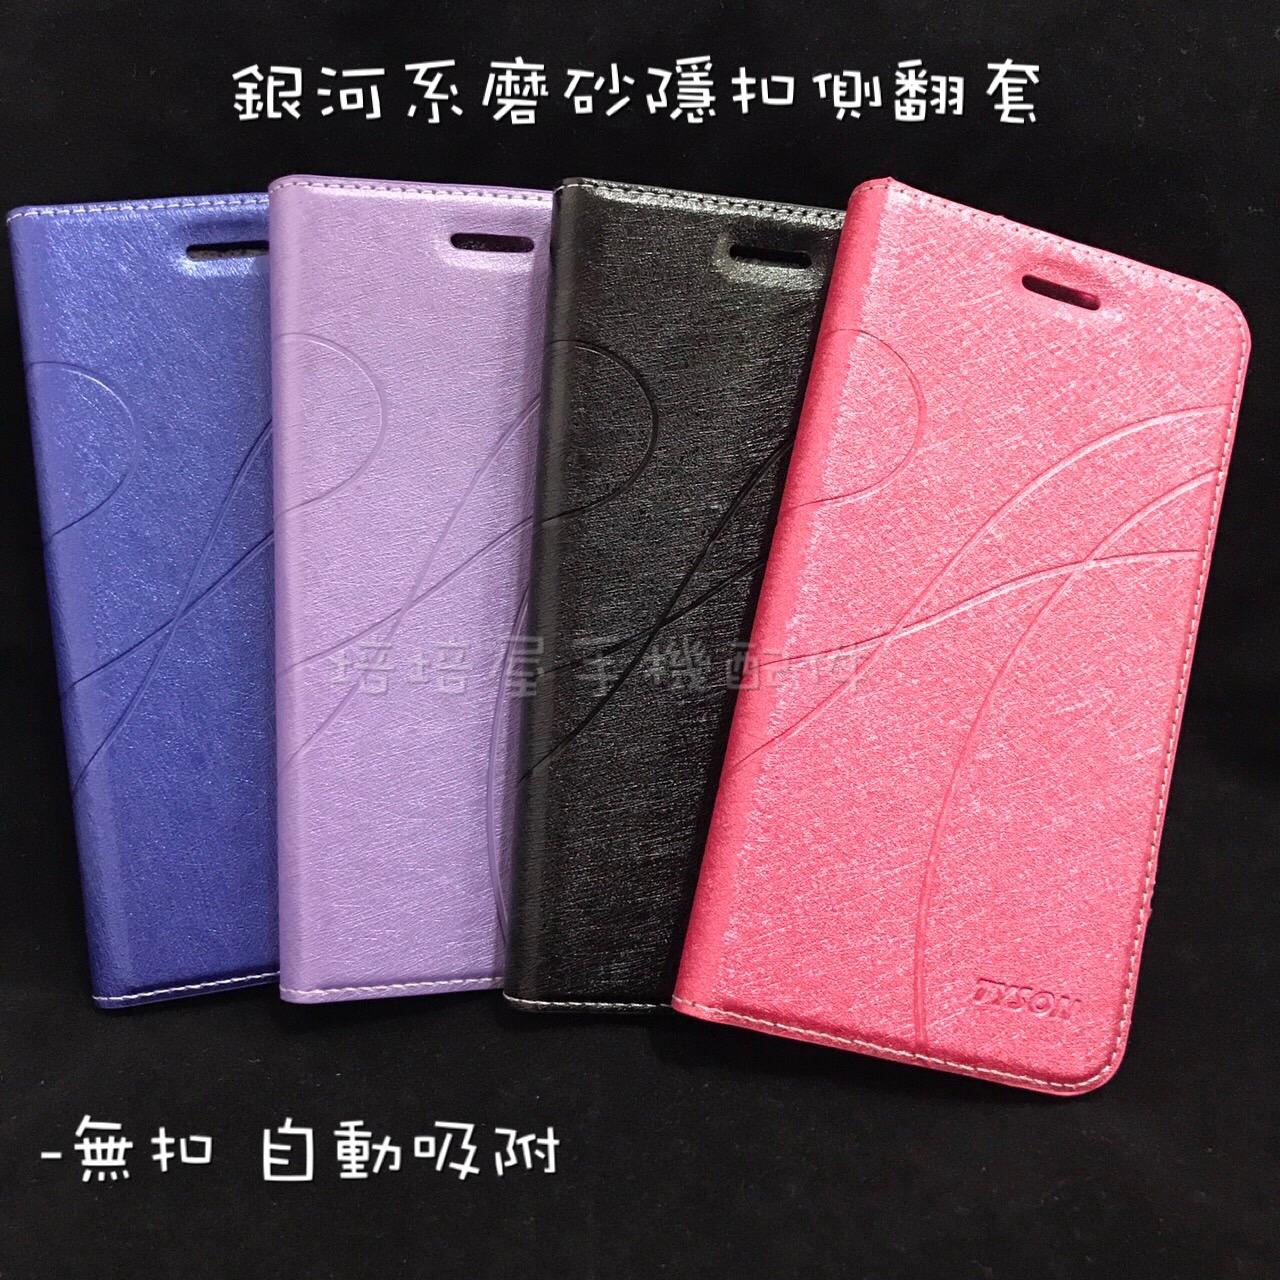 ASUS X00ADA ZenFone Go ZB500KL銀河系磨砂無扣隱形扣側翻套原裝正品手機套保護殼書本套皮套